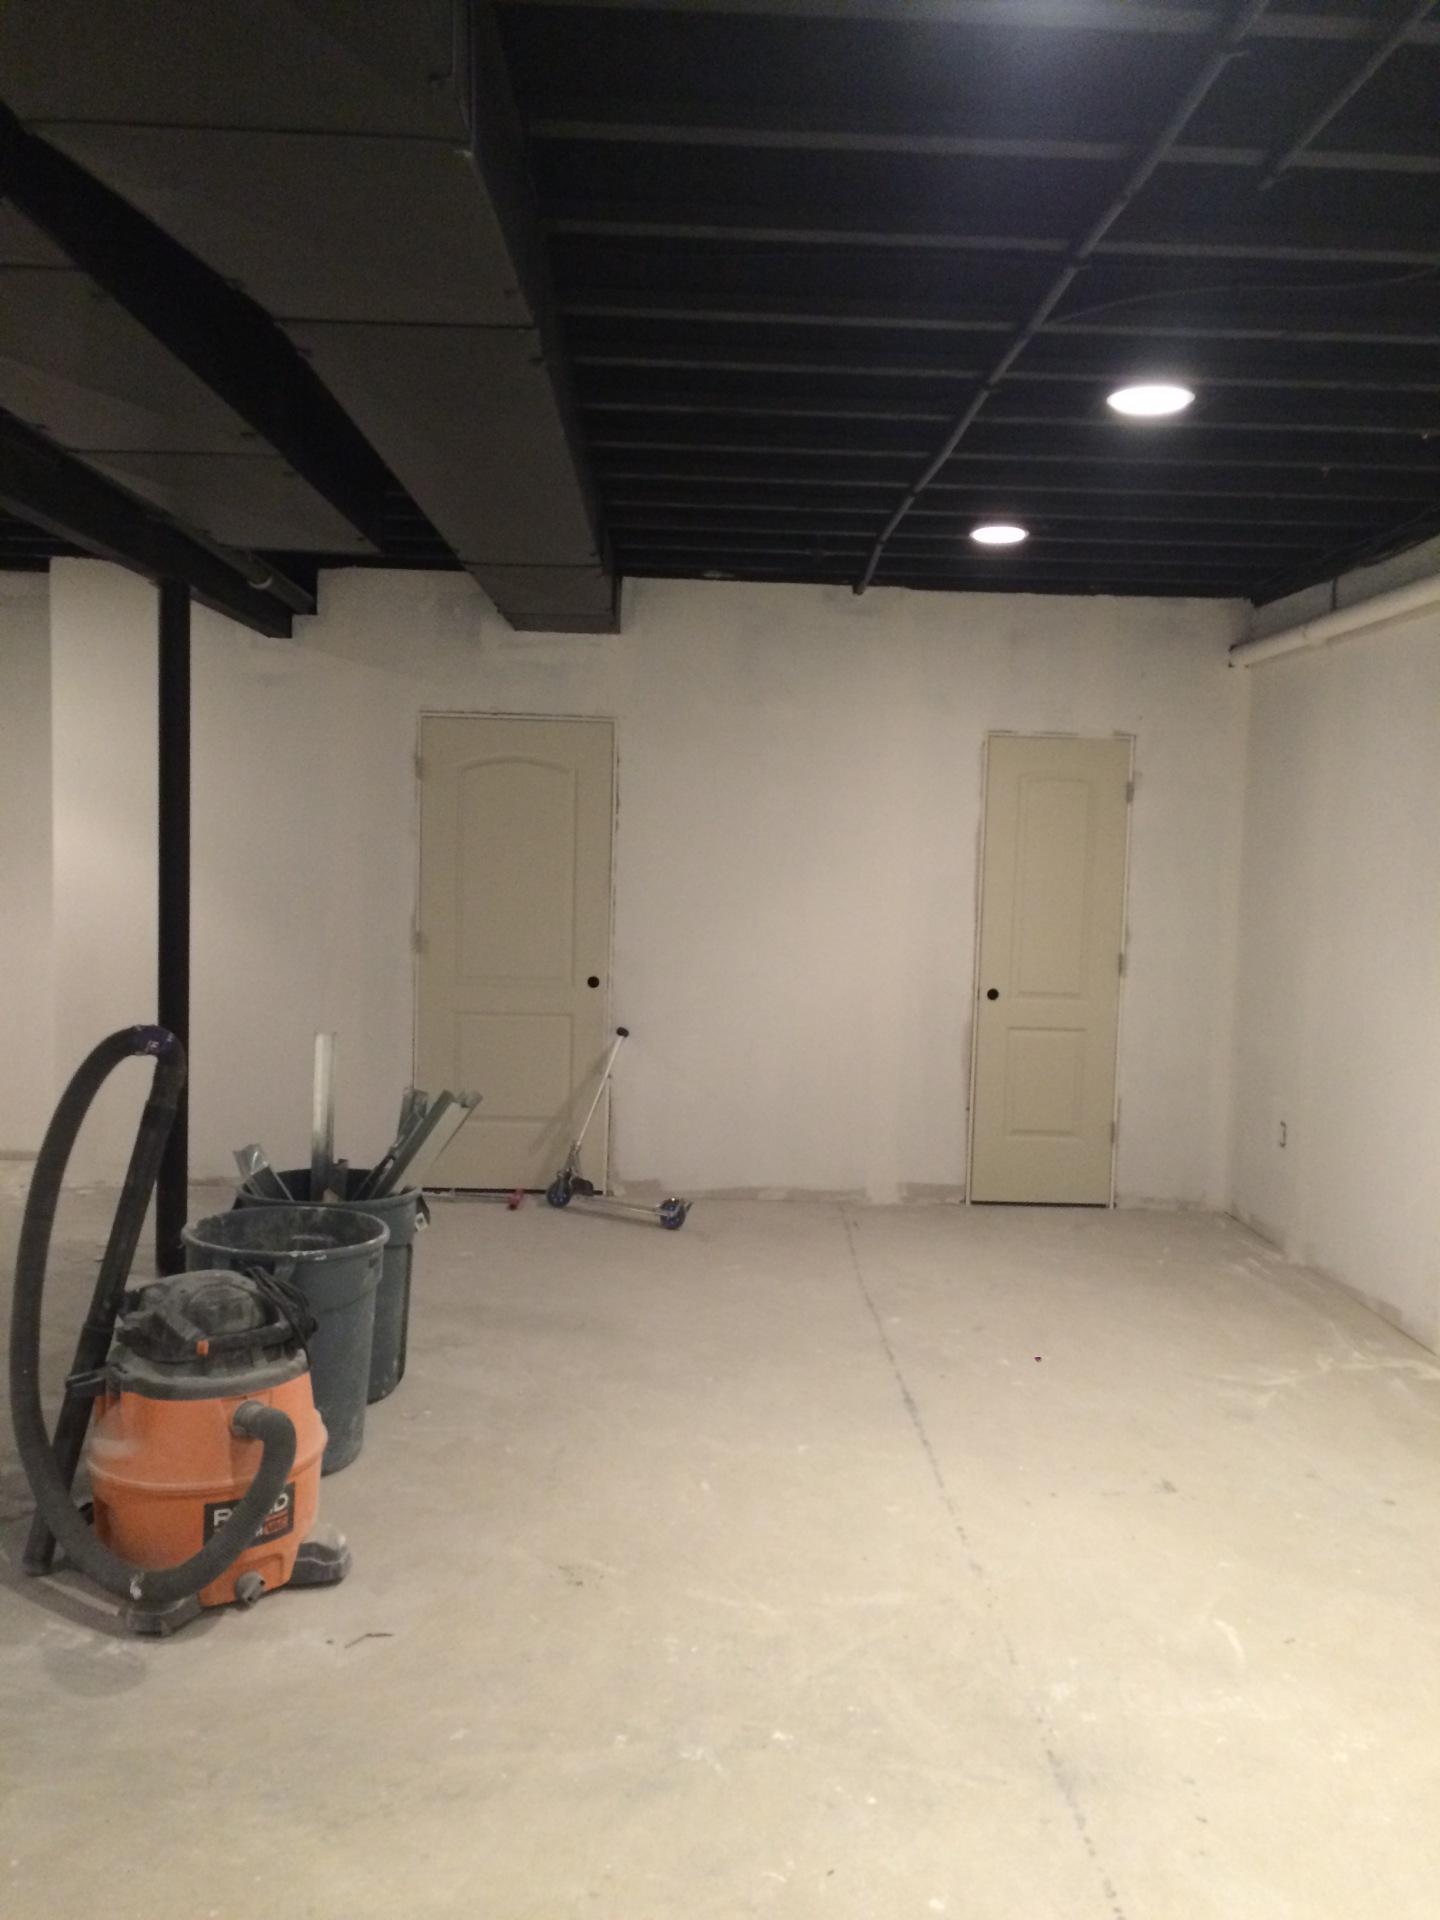 Sheetrock and Doors